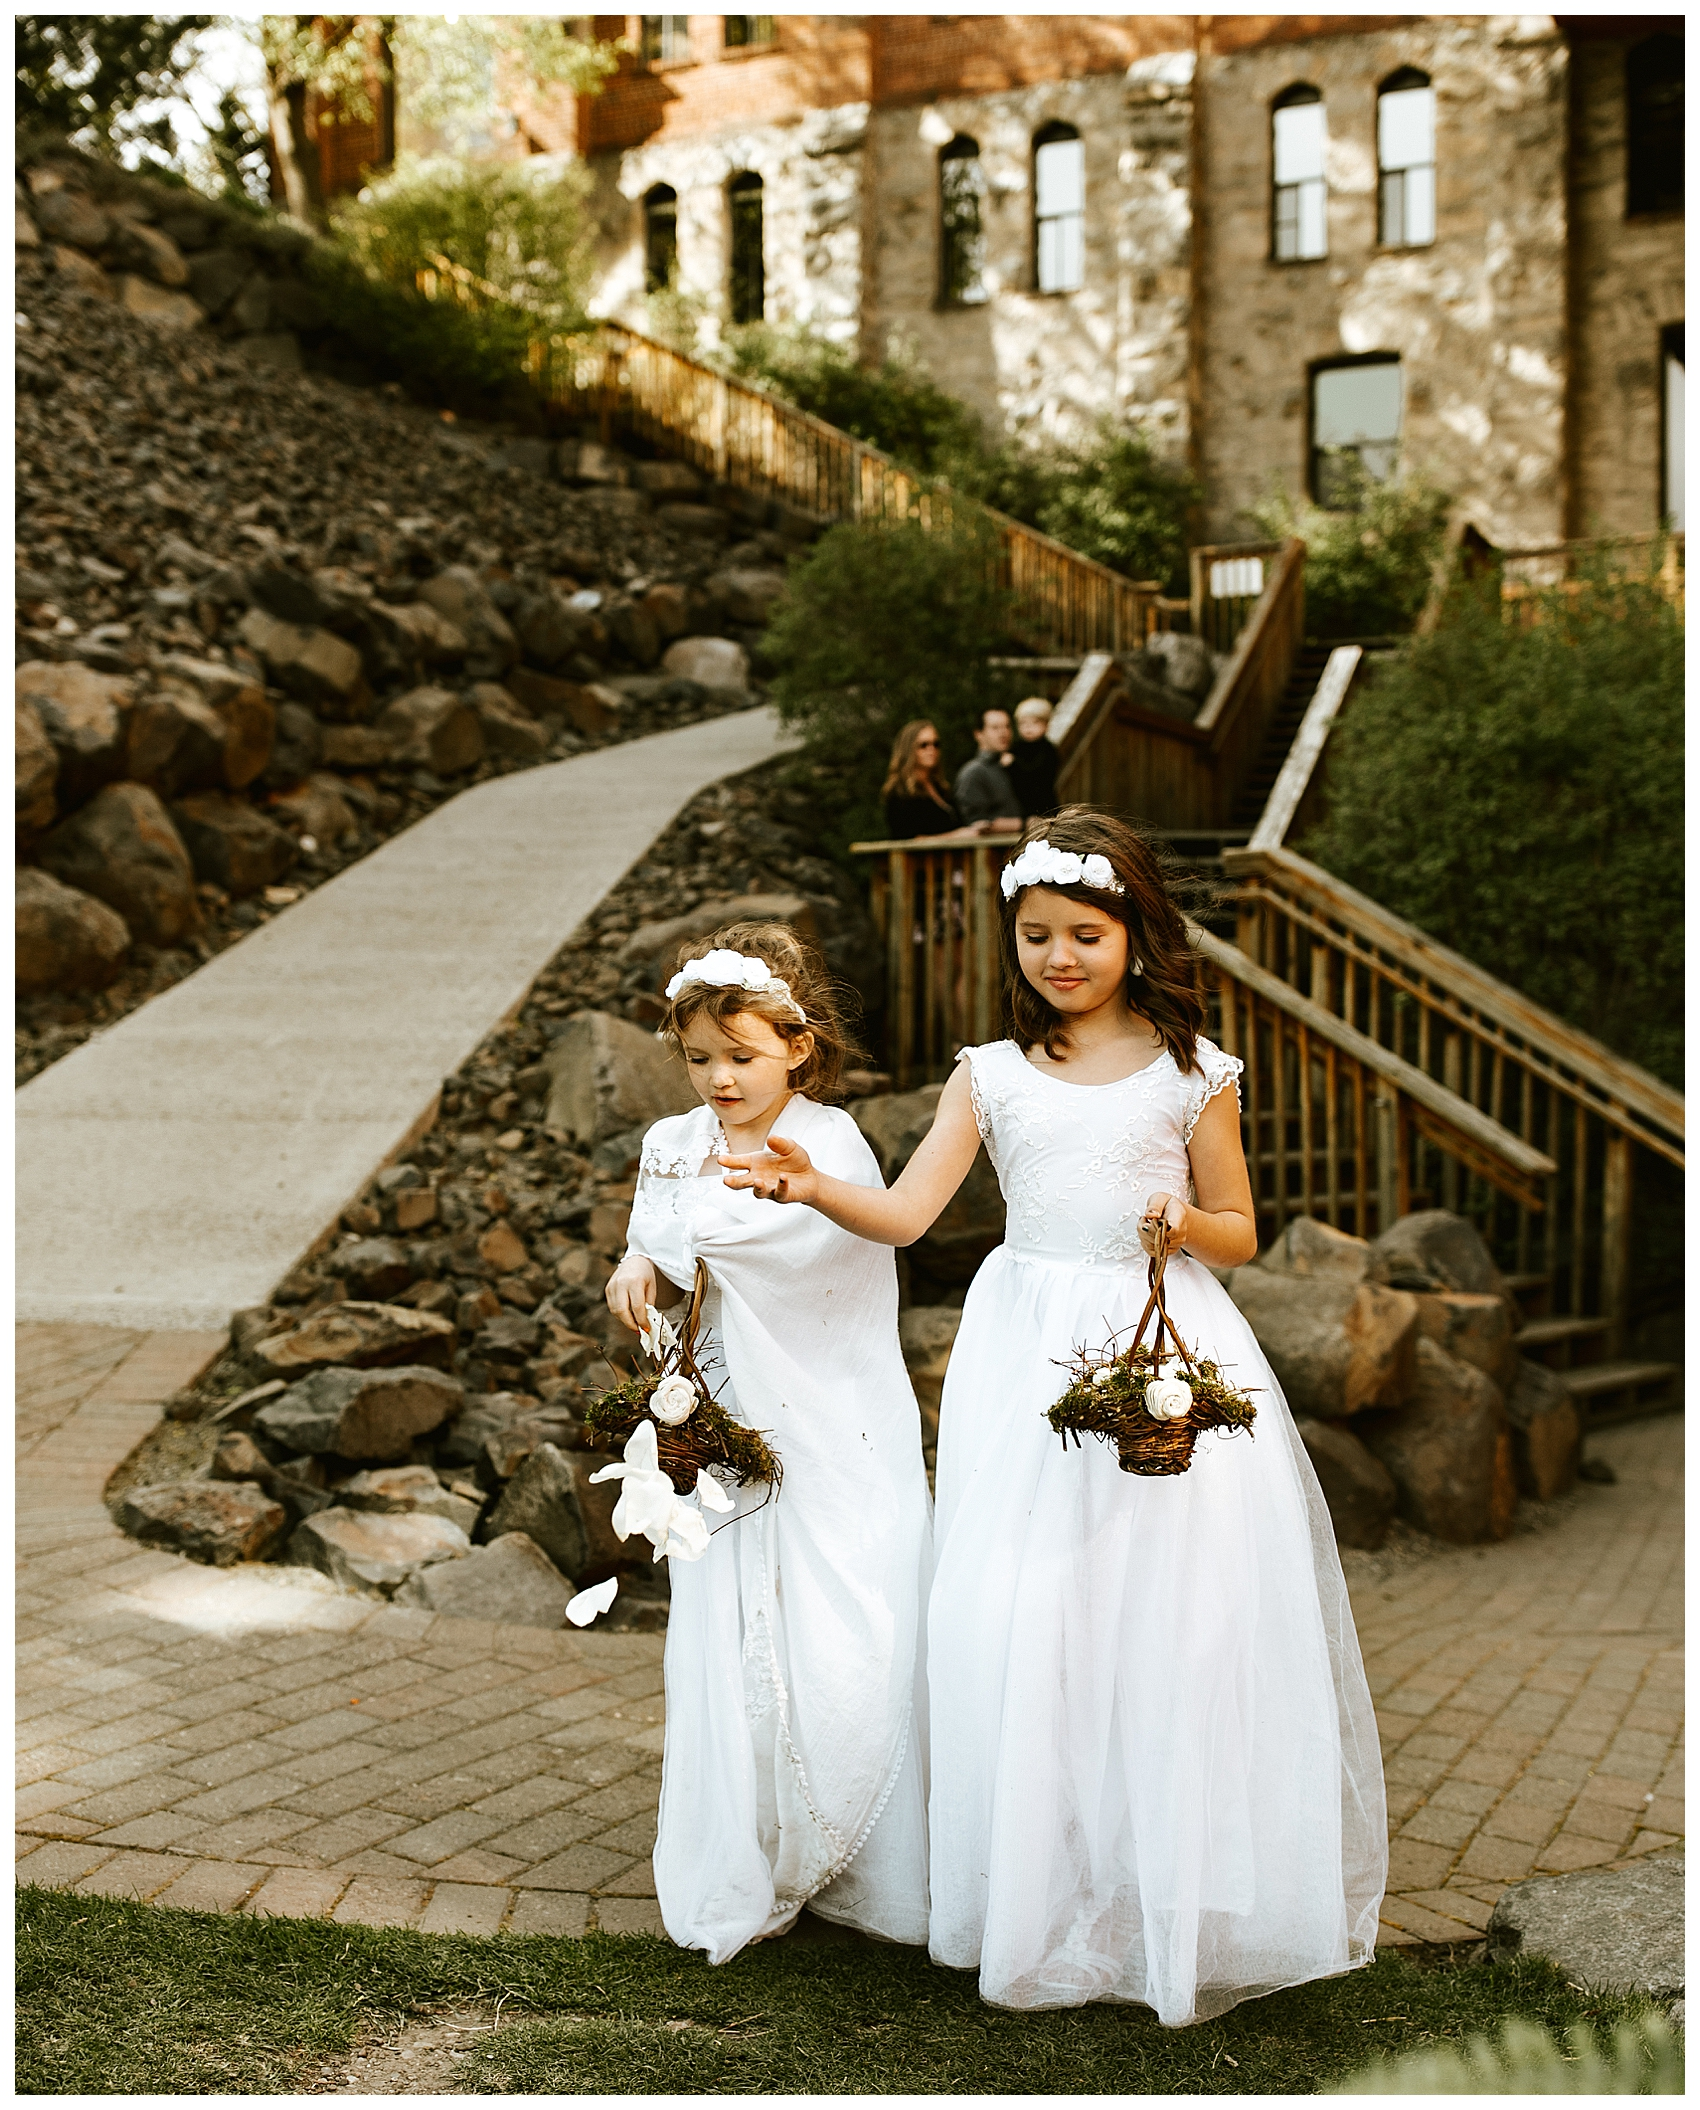 Chateau Rive Spokane Wedding Cassie Trottier Photography01041.jpg